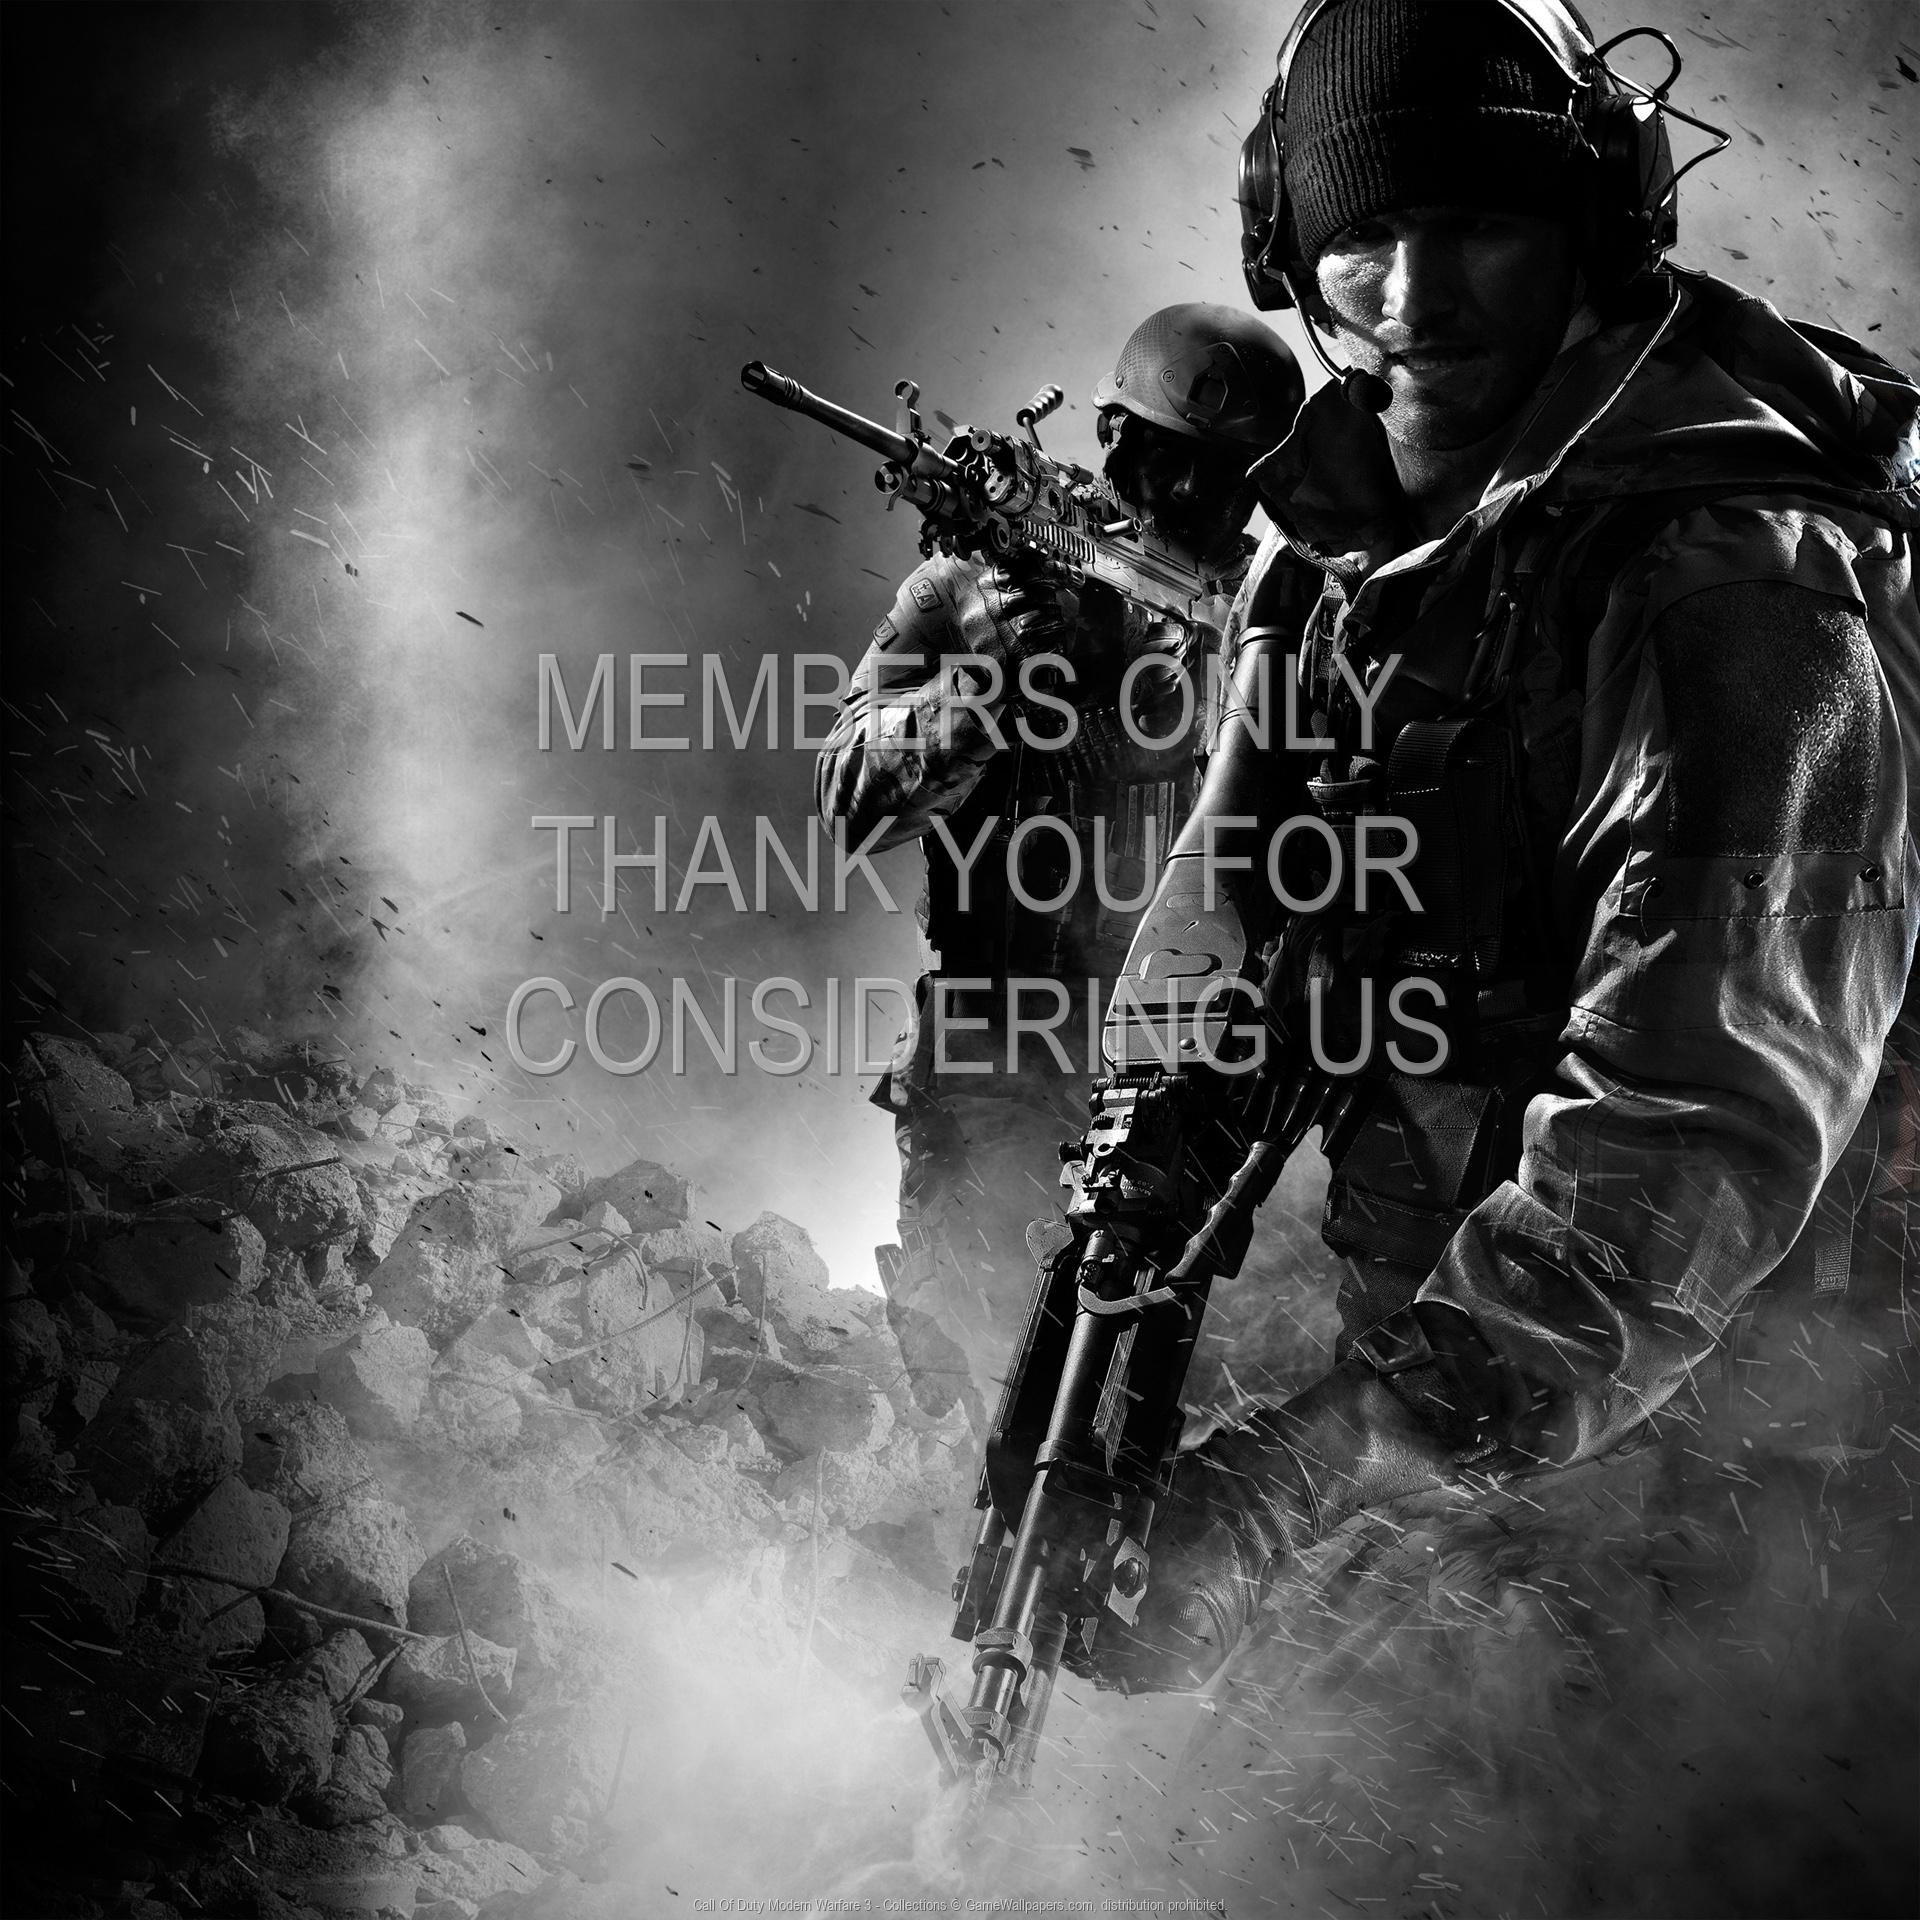 Call Of Duty: Modern Warfare 3 - Collections 1920x1080 Handy Hintergrundbild 01